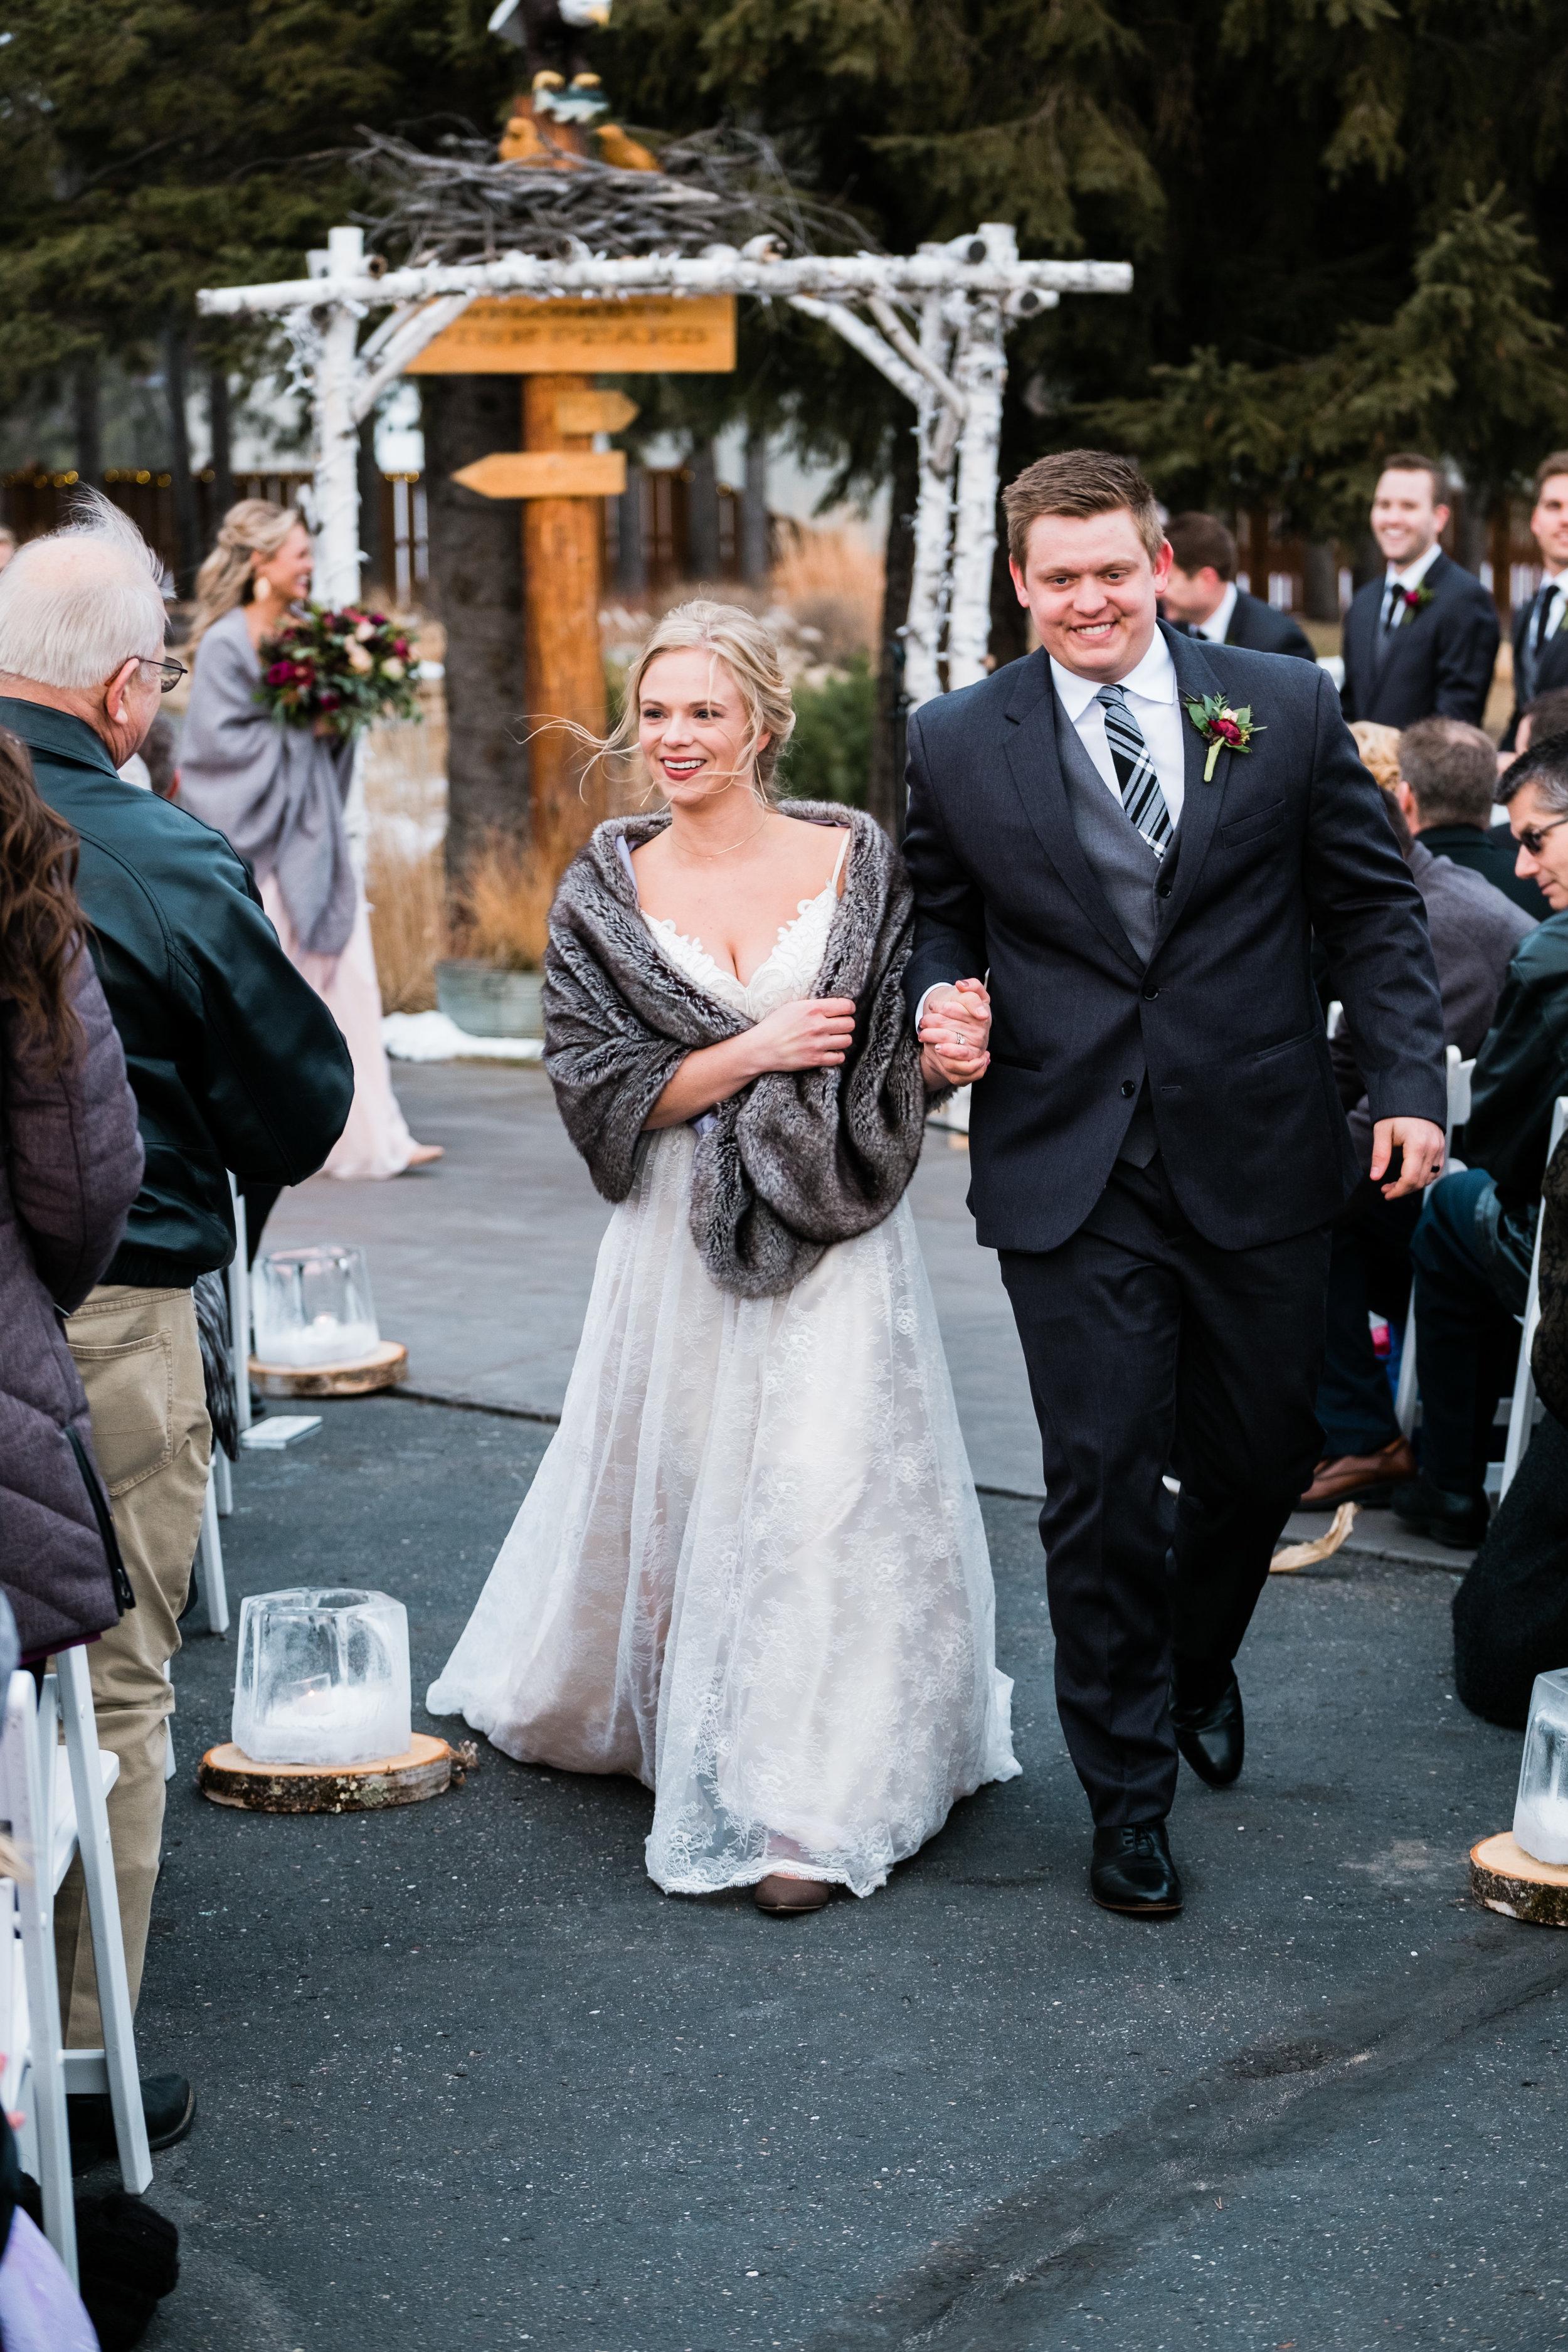 pine peaks wedding photogapher ceremony iamges